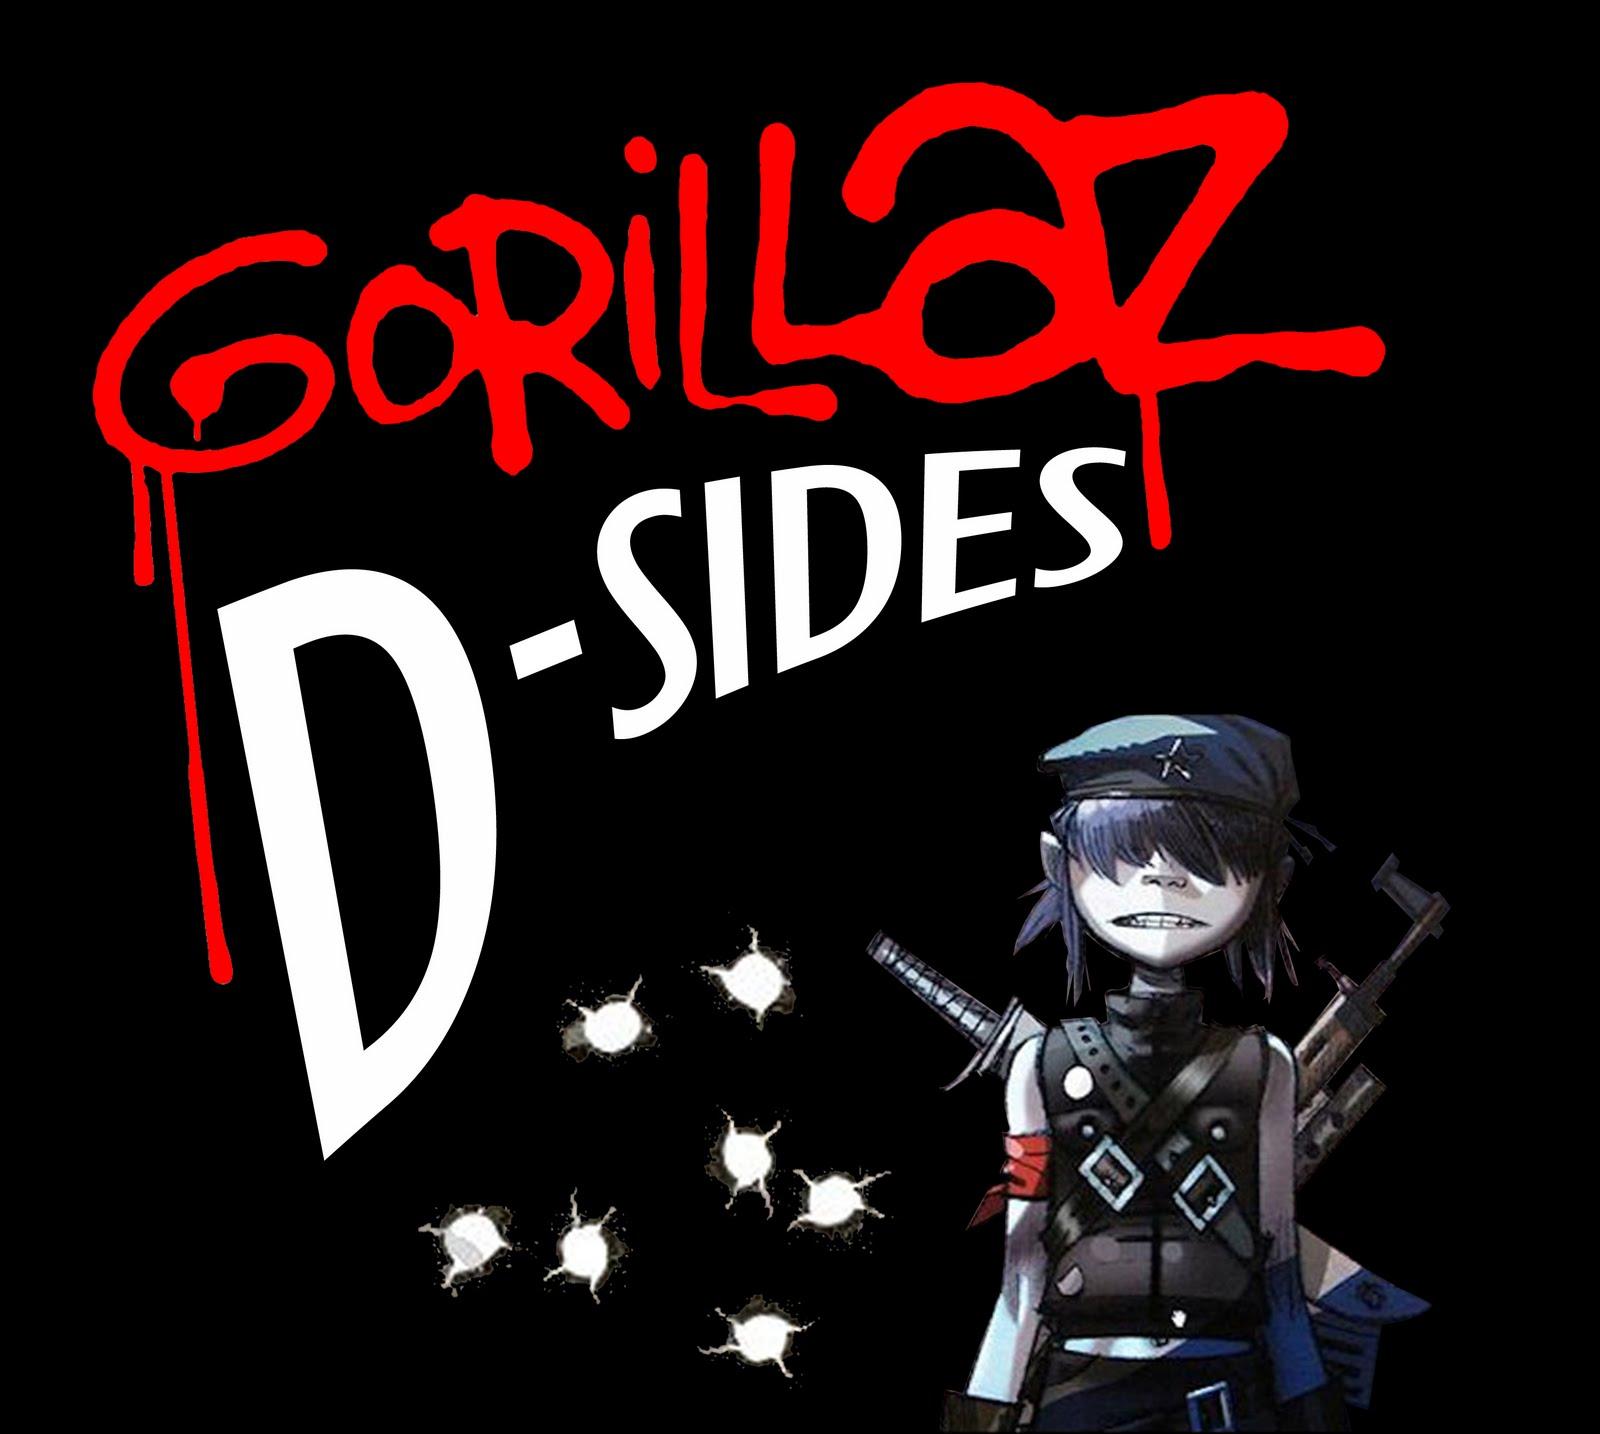 Gorillaz d sides - photo#8